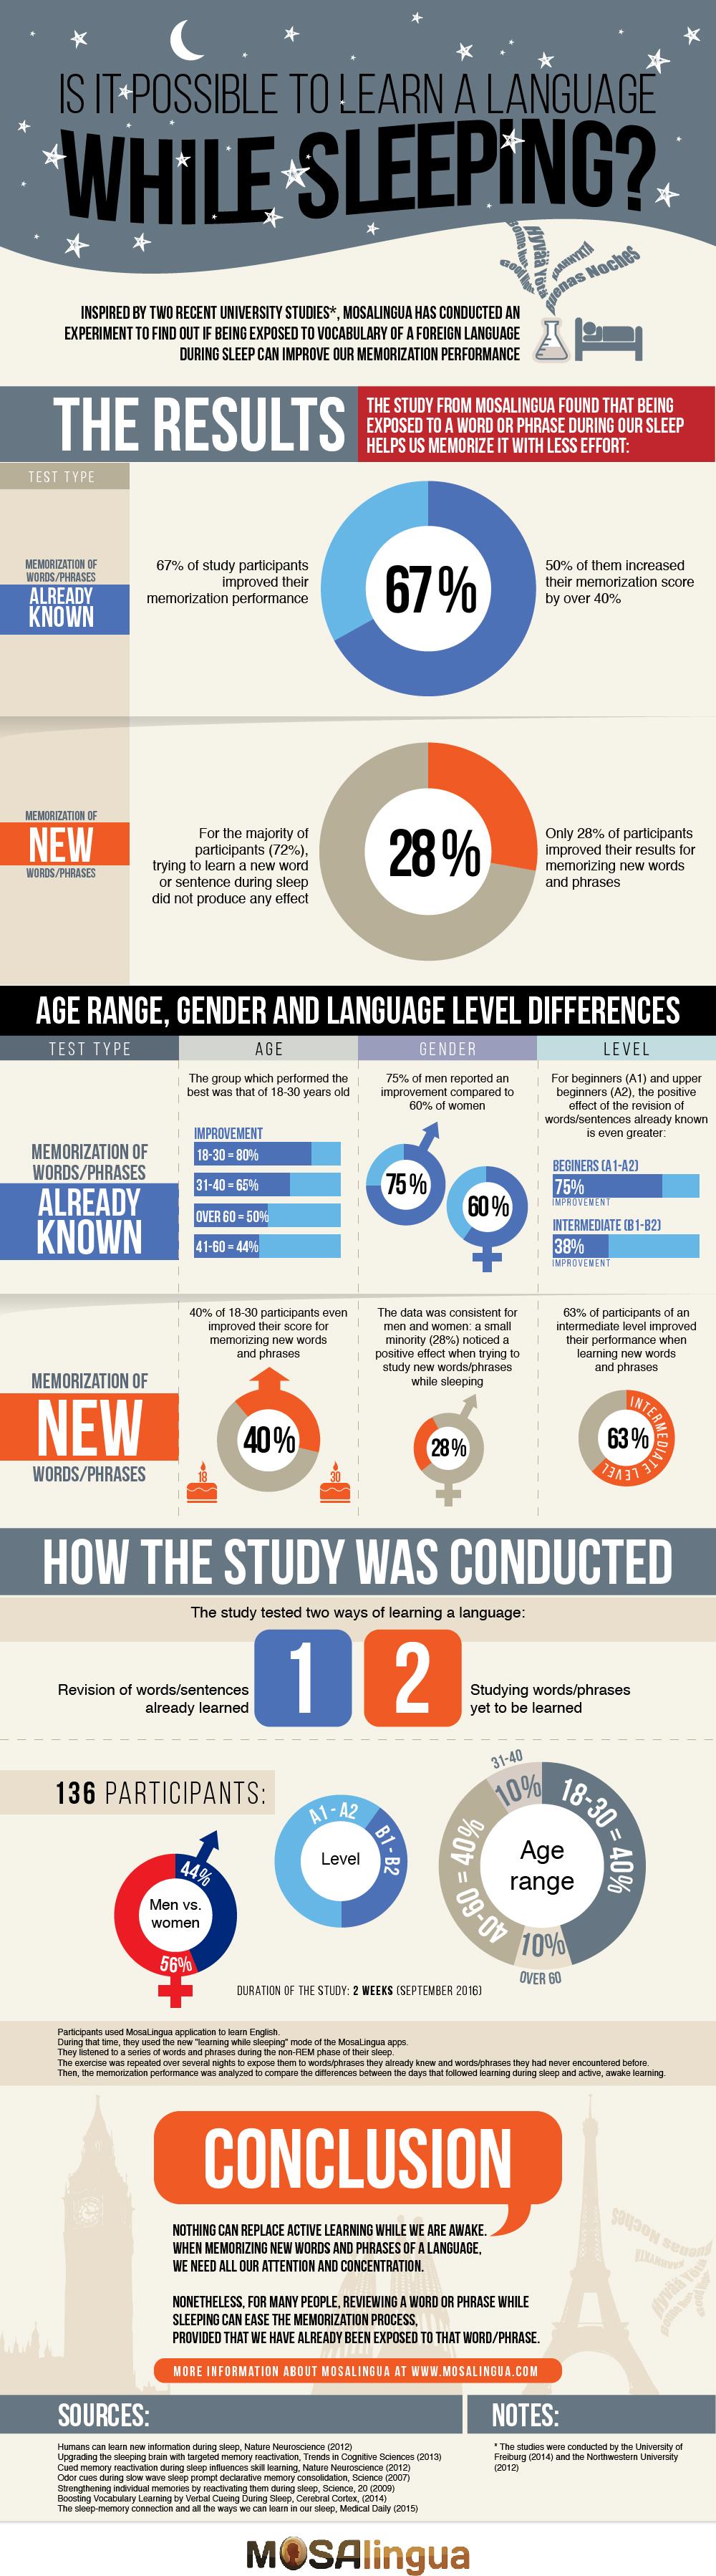 Learning a language while sleeping (Infographic) - MosaLingua